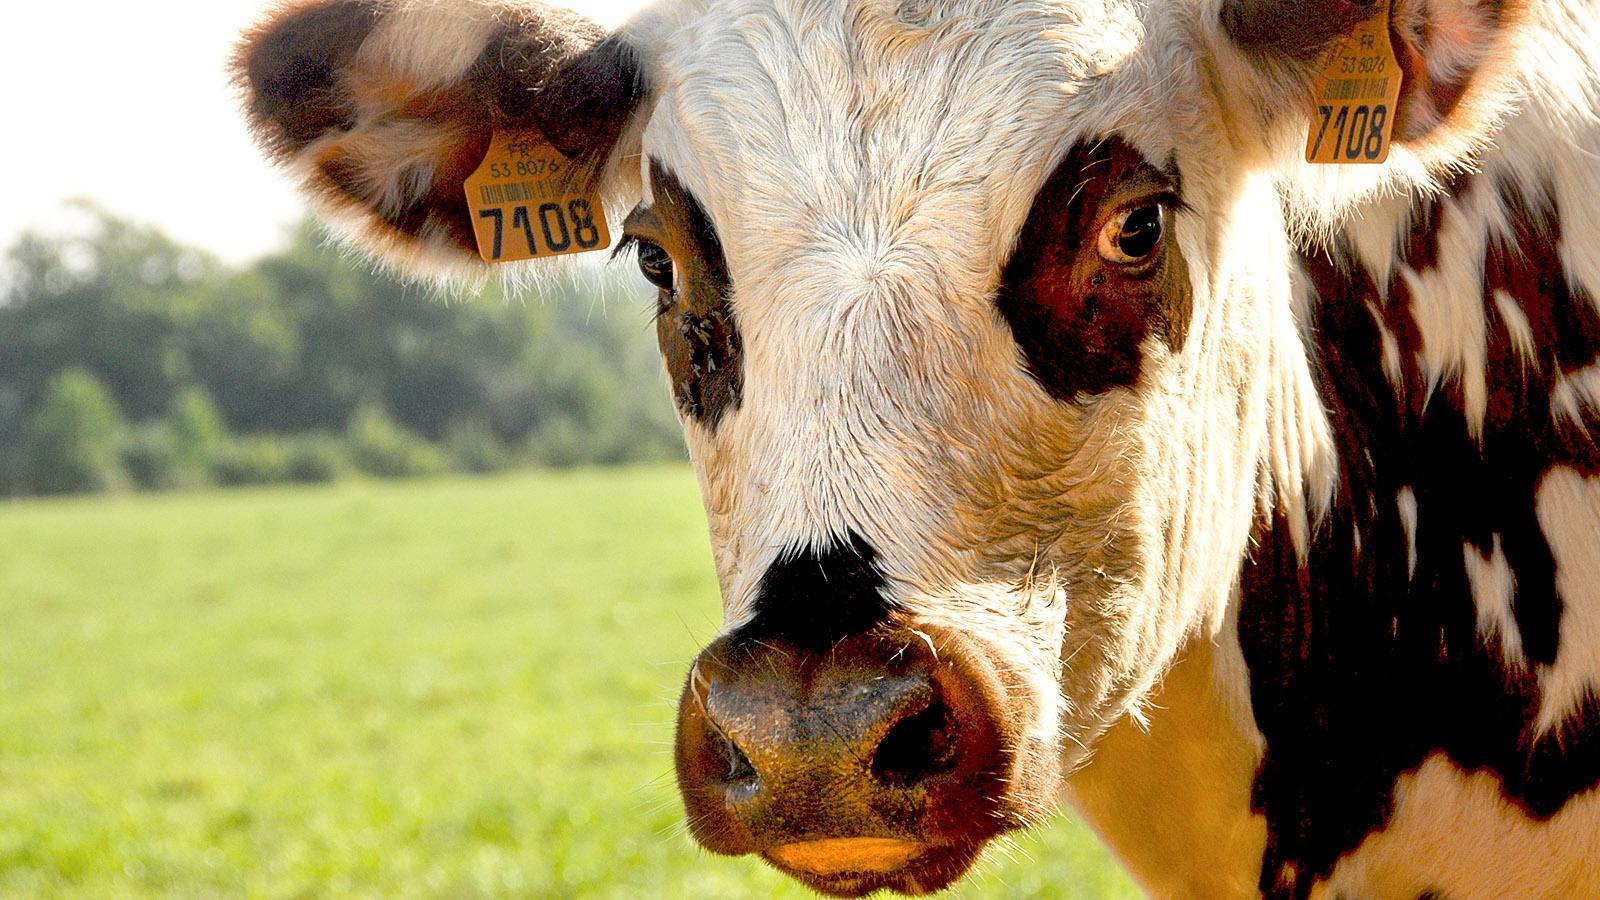 La vache normande, die Kuh der Normandie. Foto: Hilke Maunder